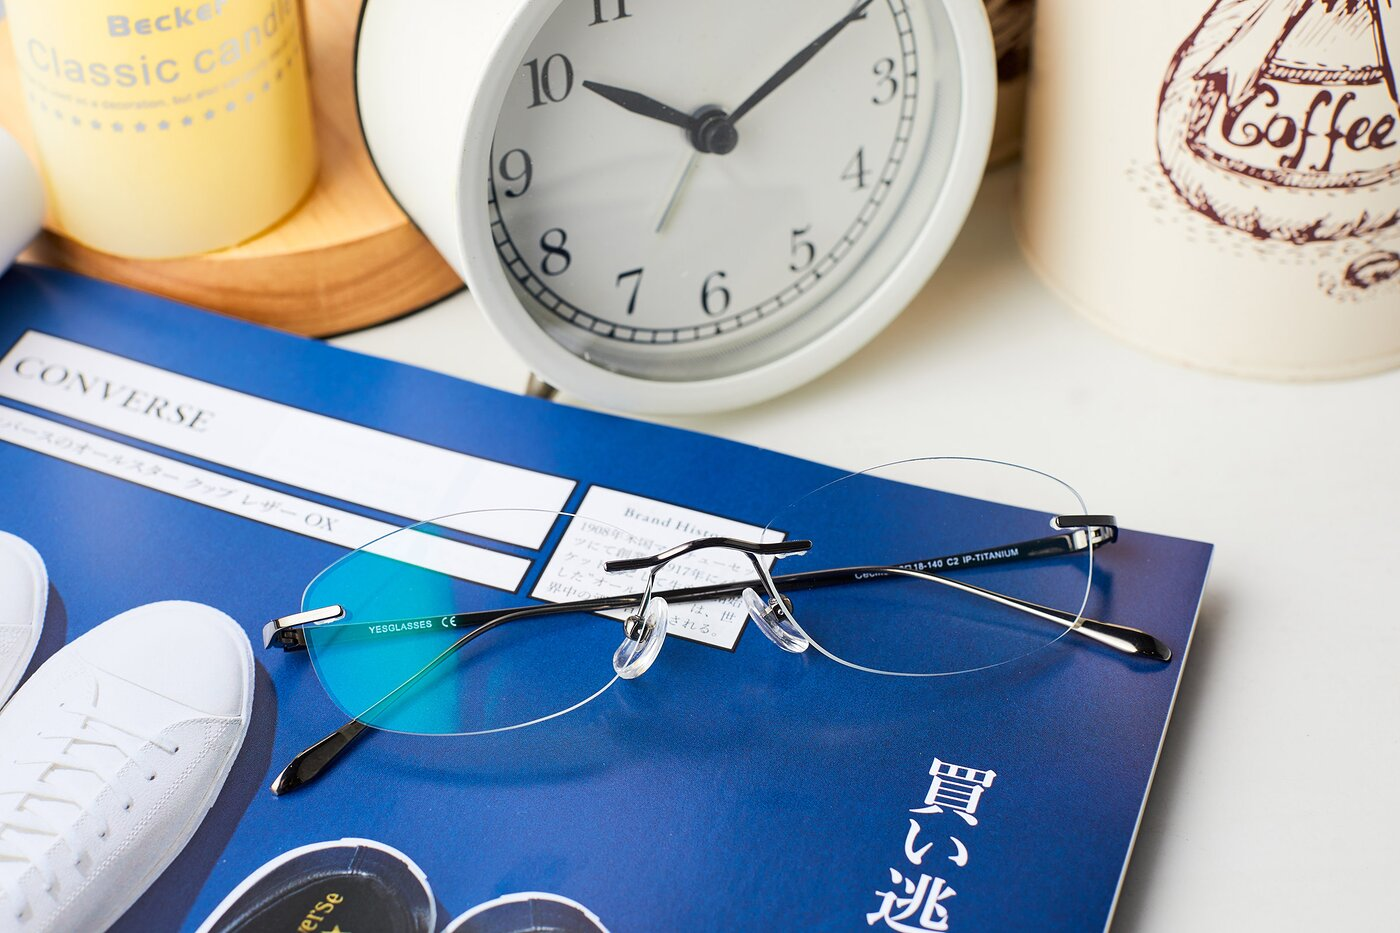 Gun Classic Oval Rimless Eyeglasses